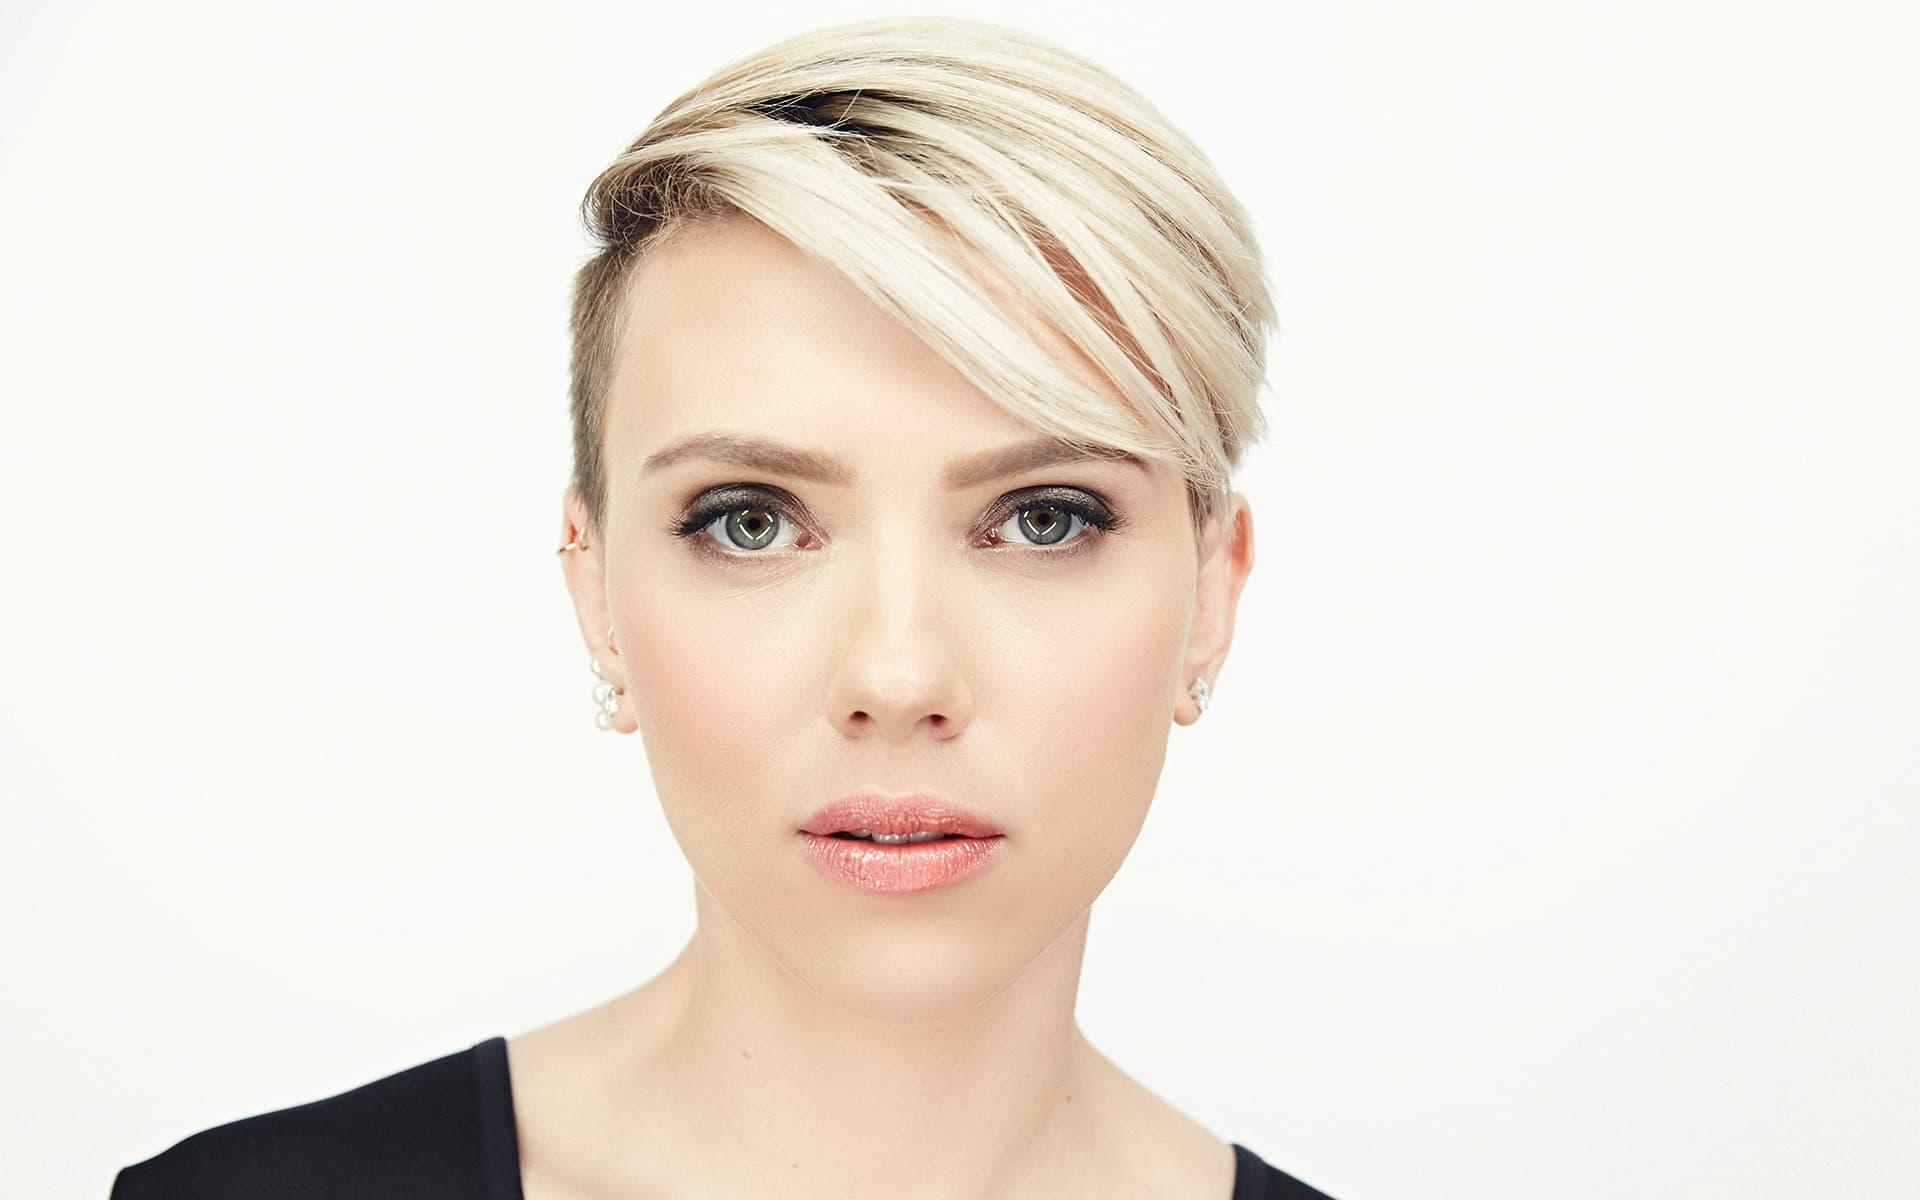 Скарлетт Йоханссон актер